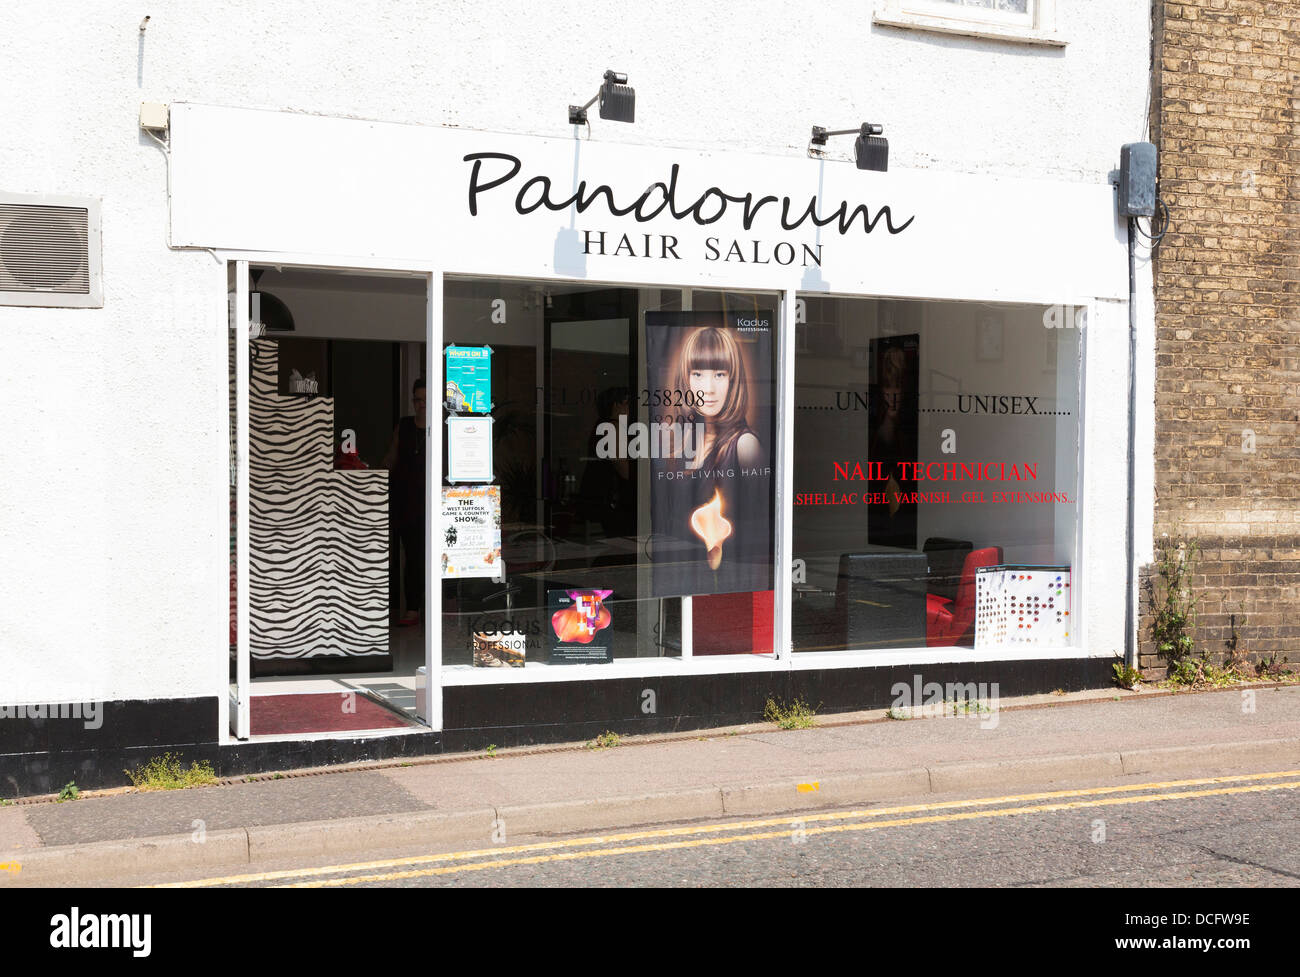 exterior of Pandorum hairdressing salon - Stock Image